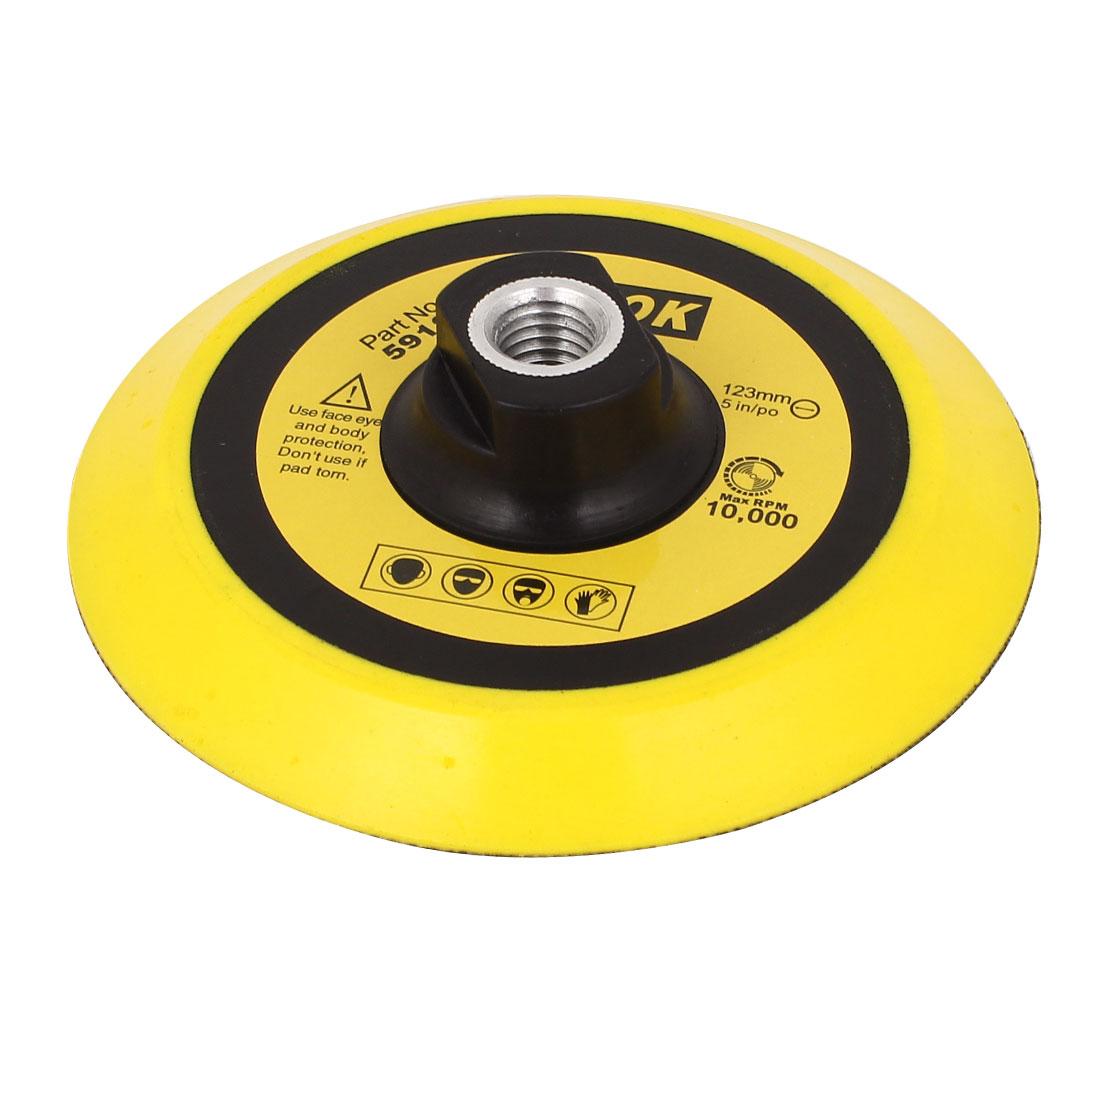 "Unique Bargains 13mm Thread Car 5"" Dia Black Yellow Foam Buffing Pad Polishing Waxing Wheel"